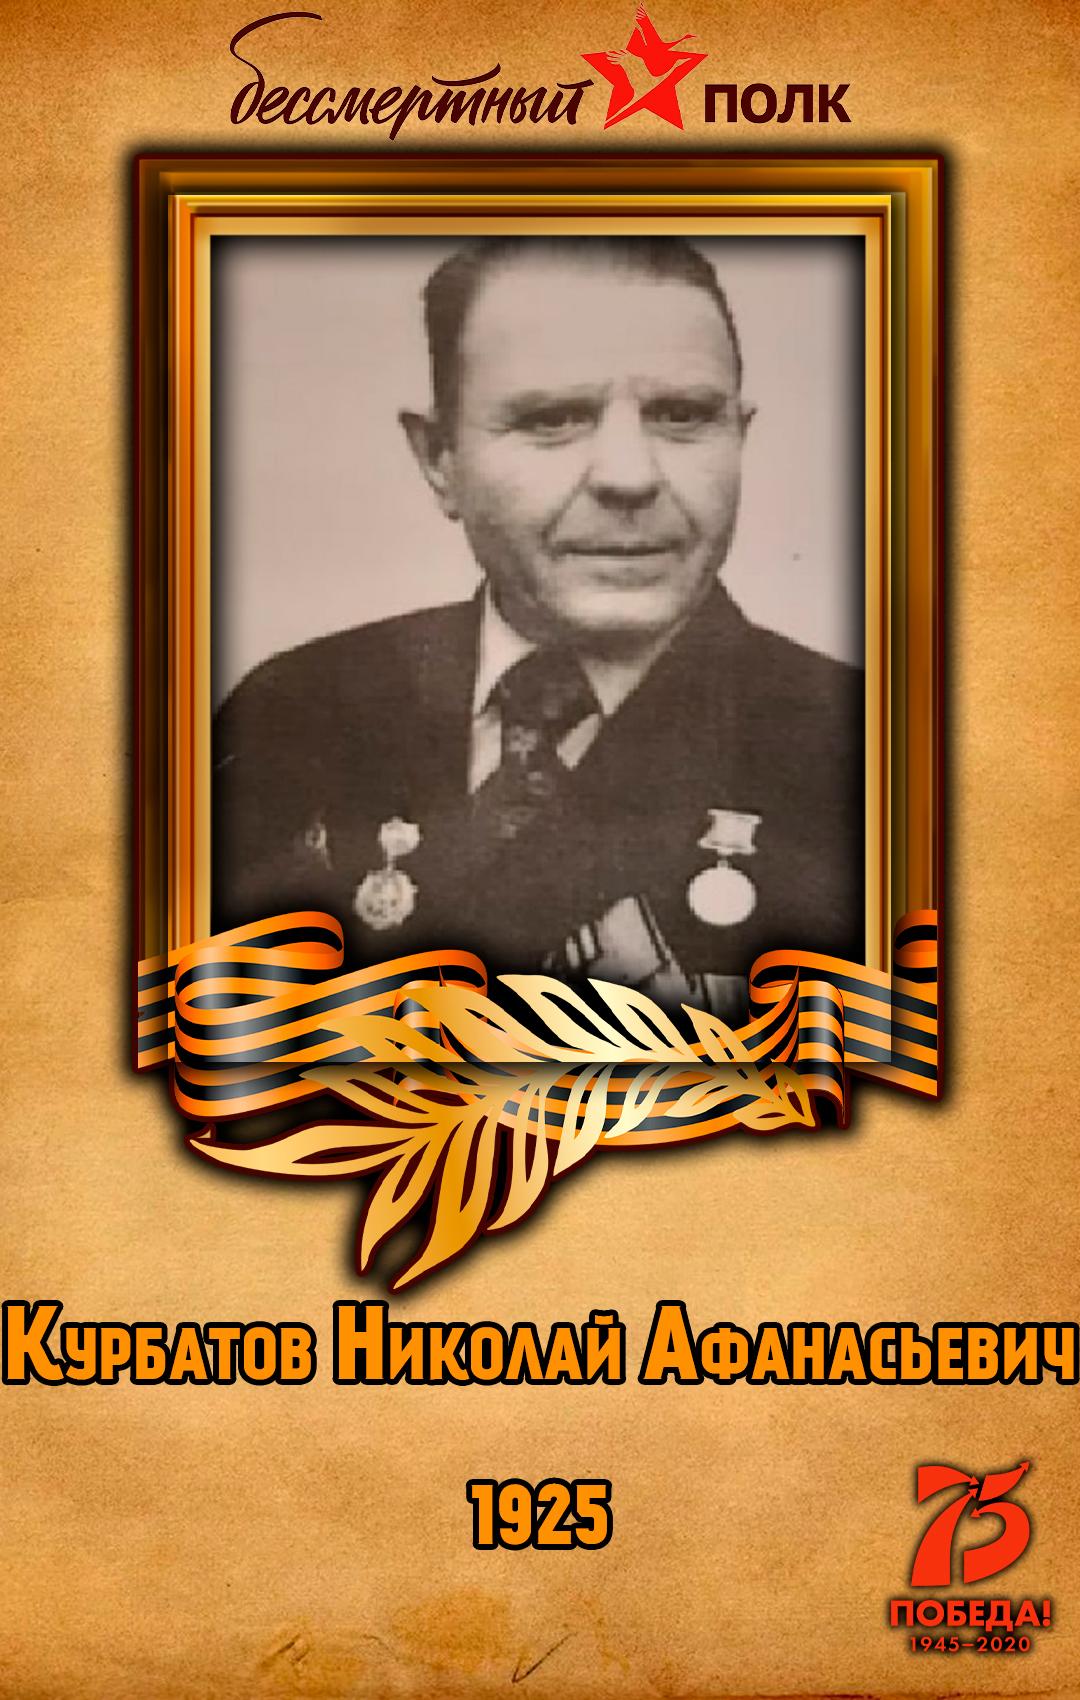 Курбатов-Николай-Афанасьевич